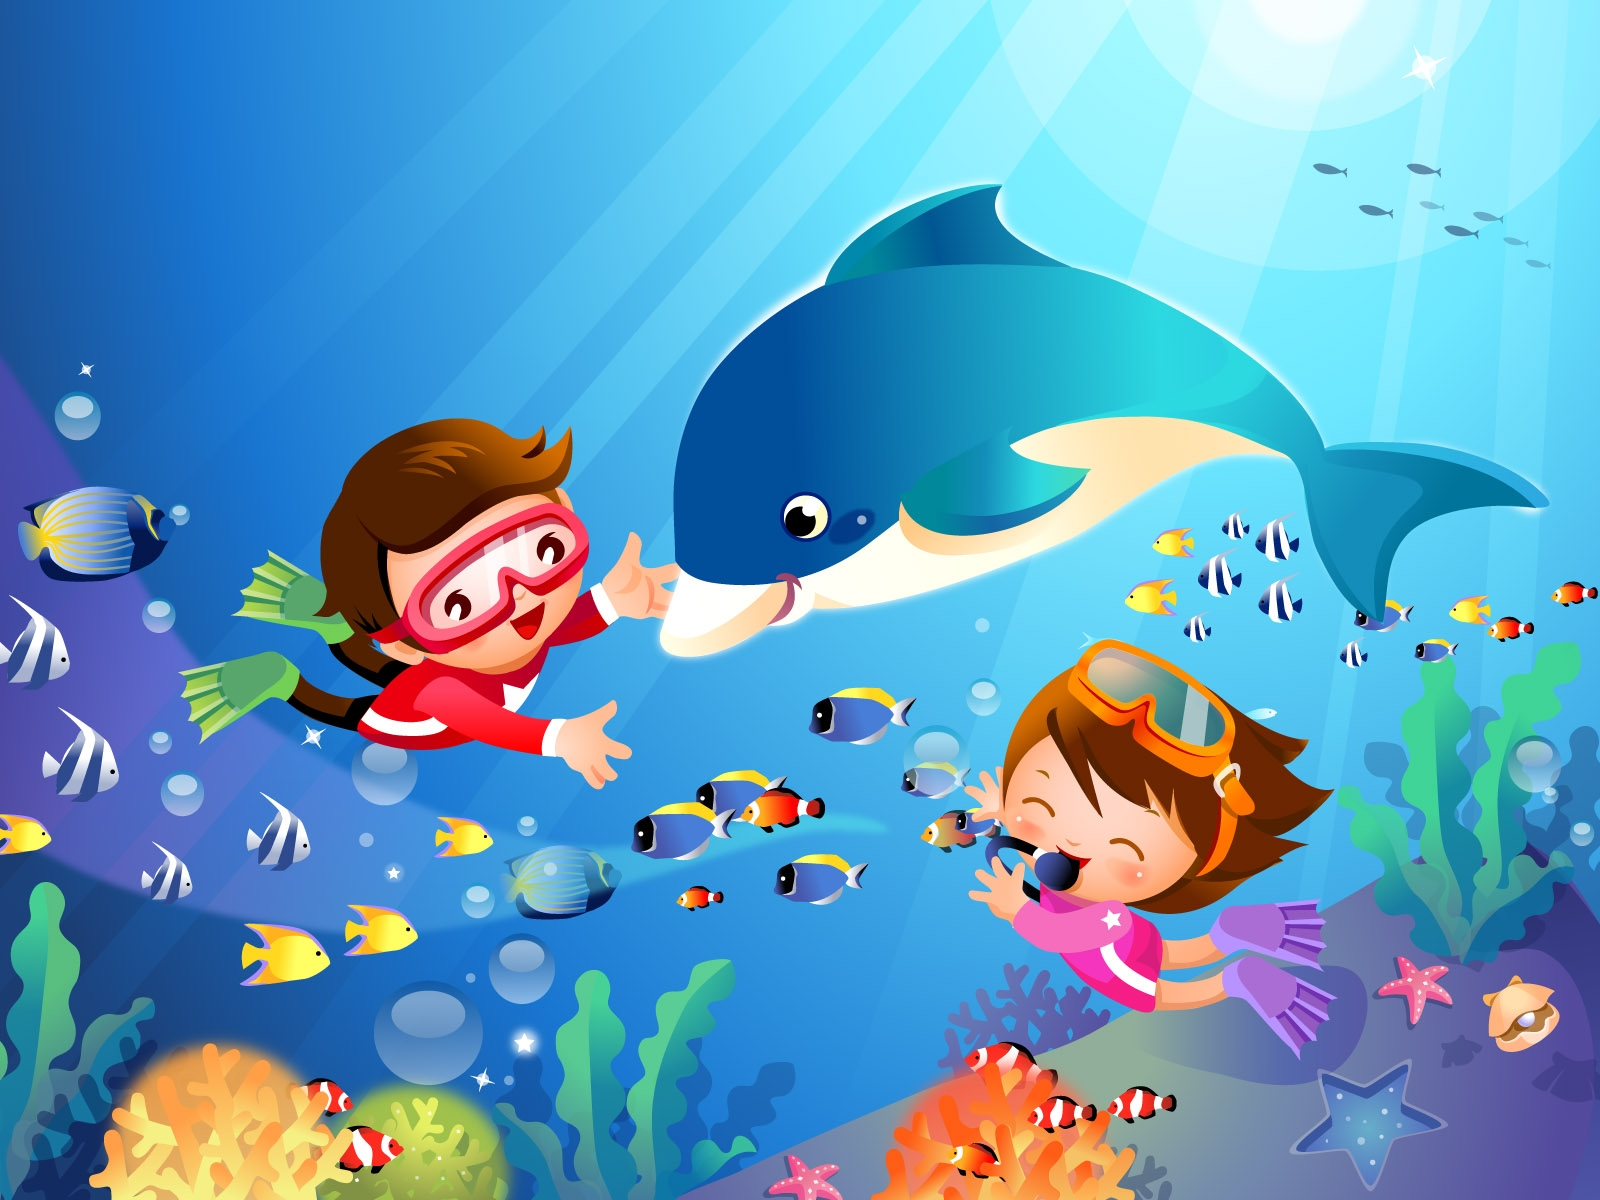 Hd 1600x1200 Sweet Children Time Desktop Wallpapers 1600x1200